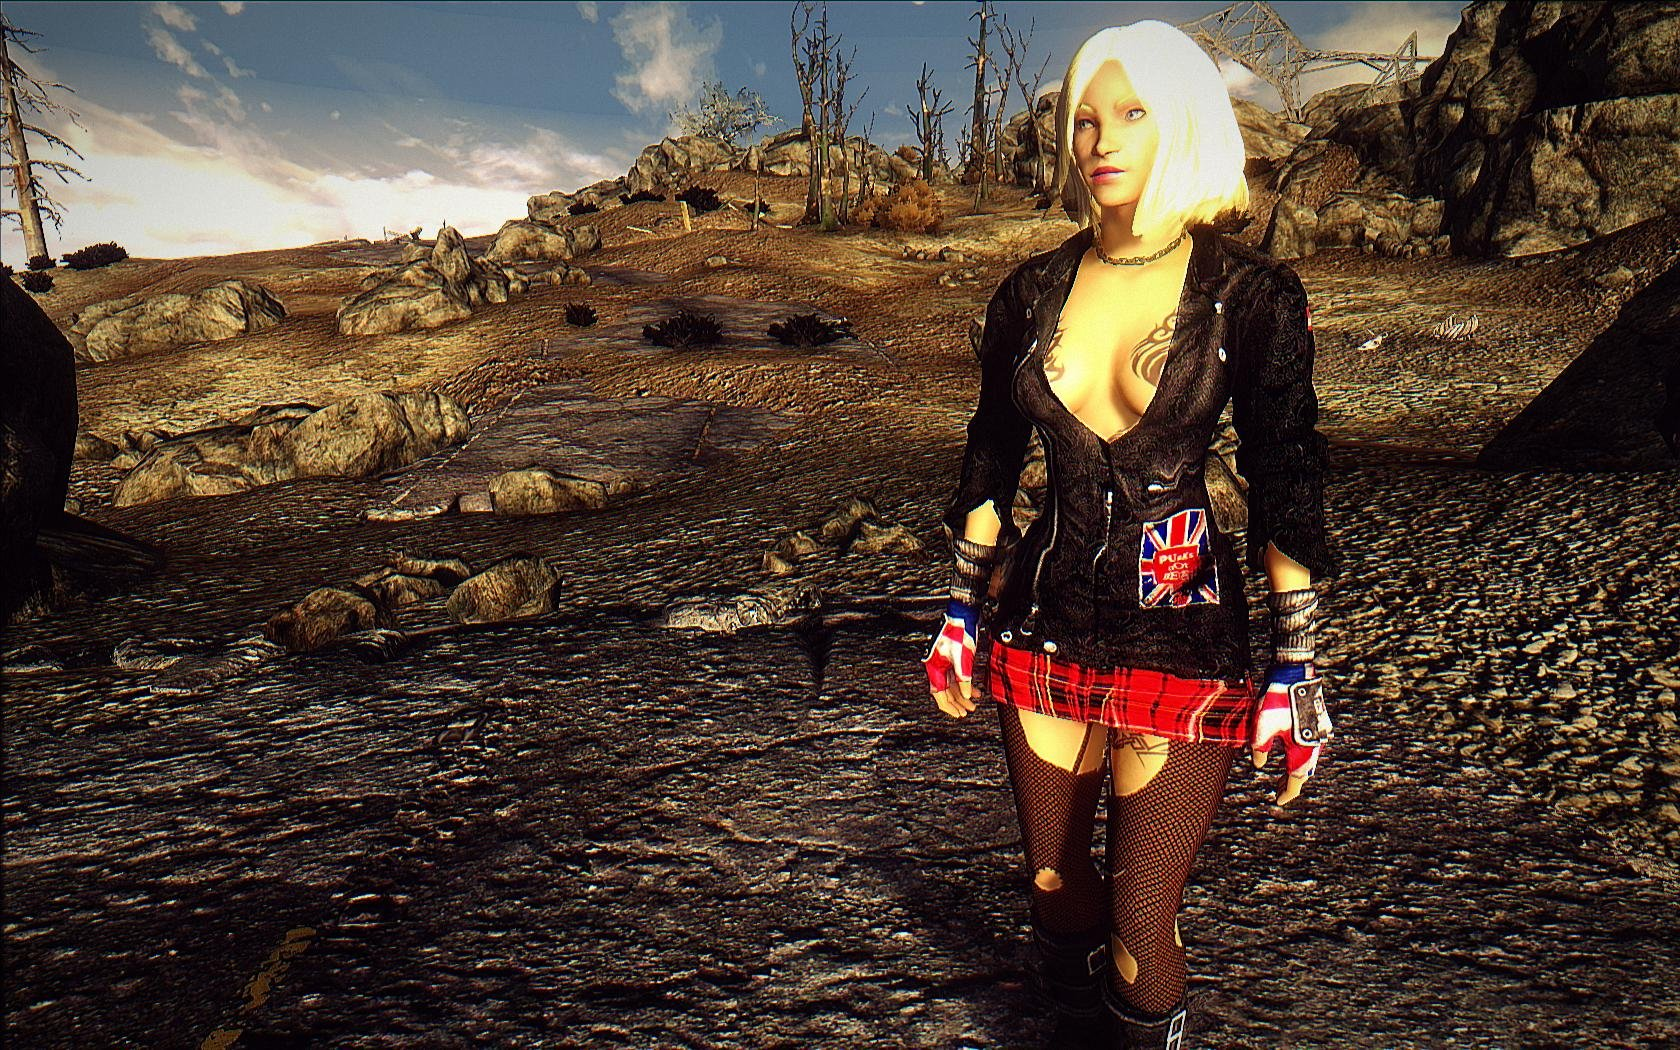 Fallout3 2019-04-09 10-55-34-34